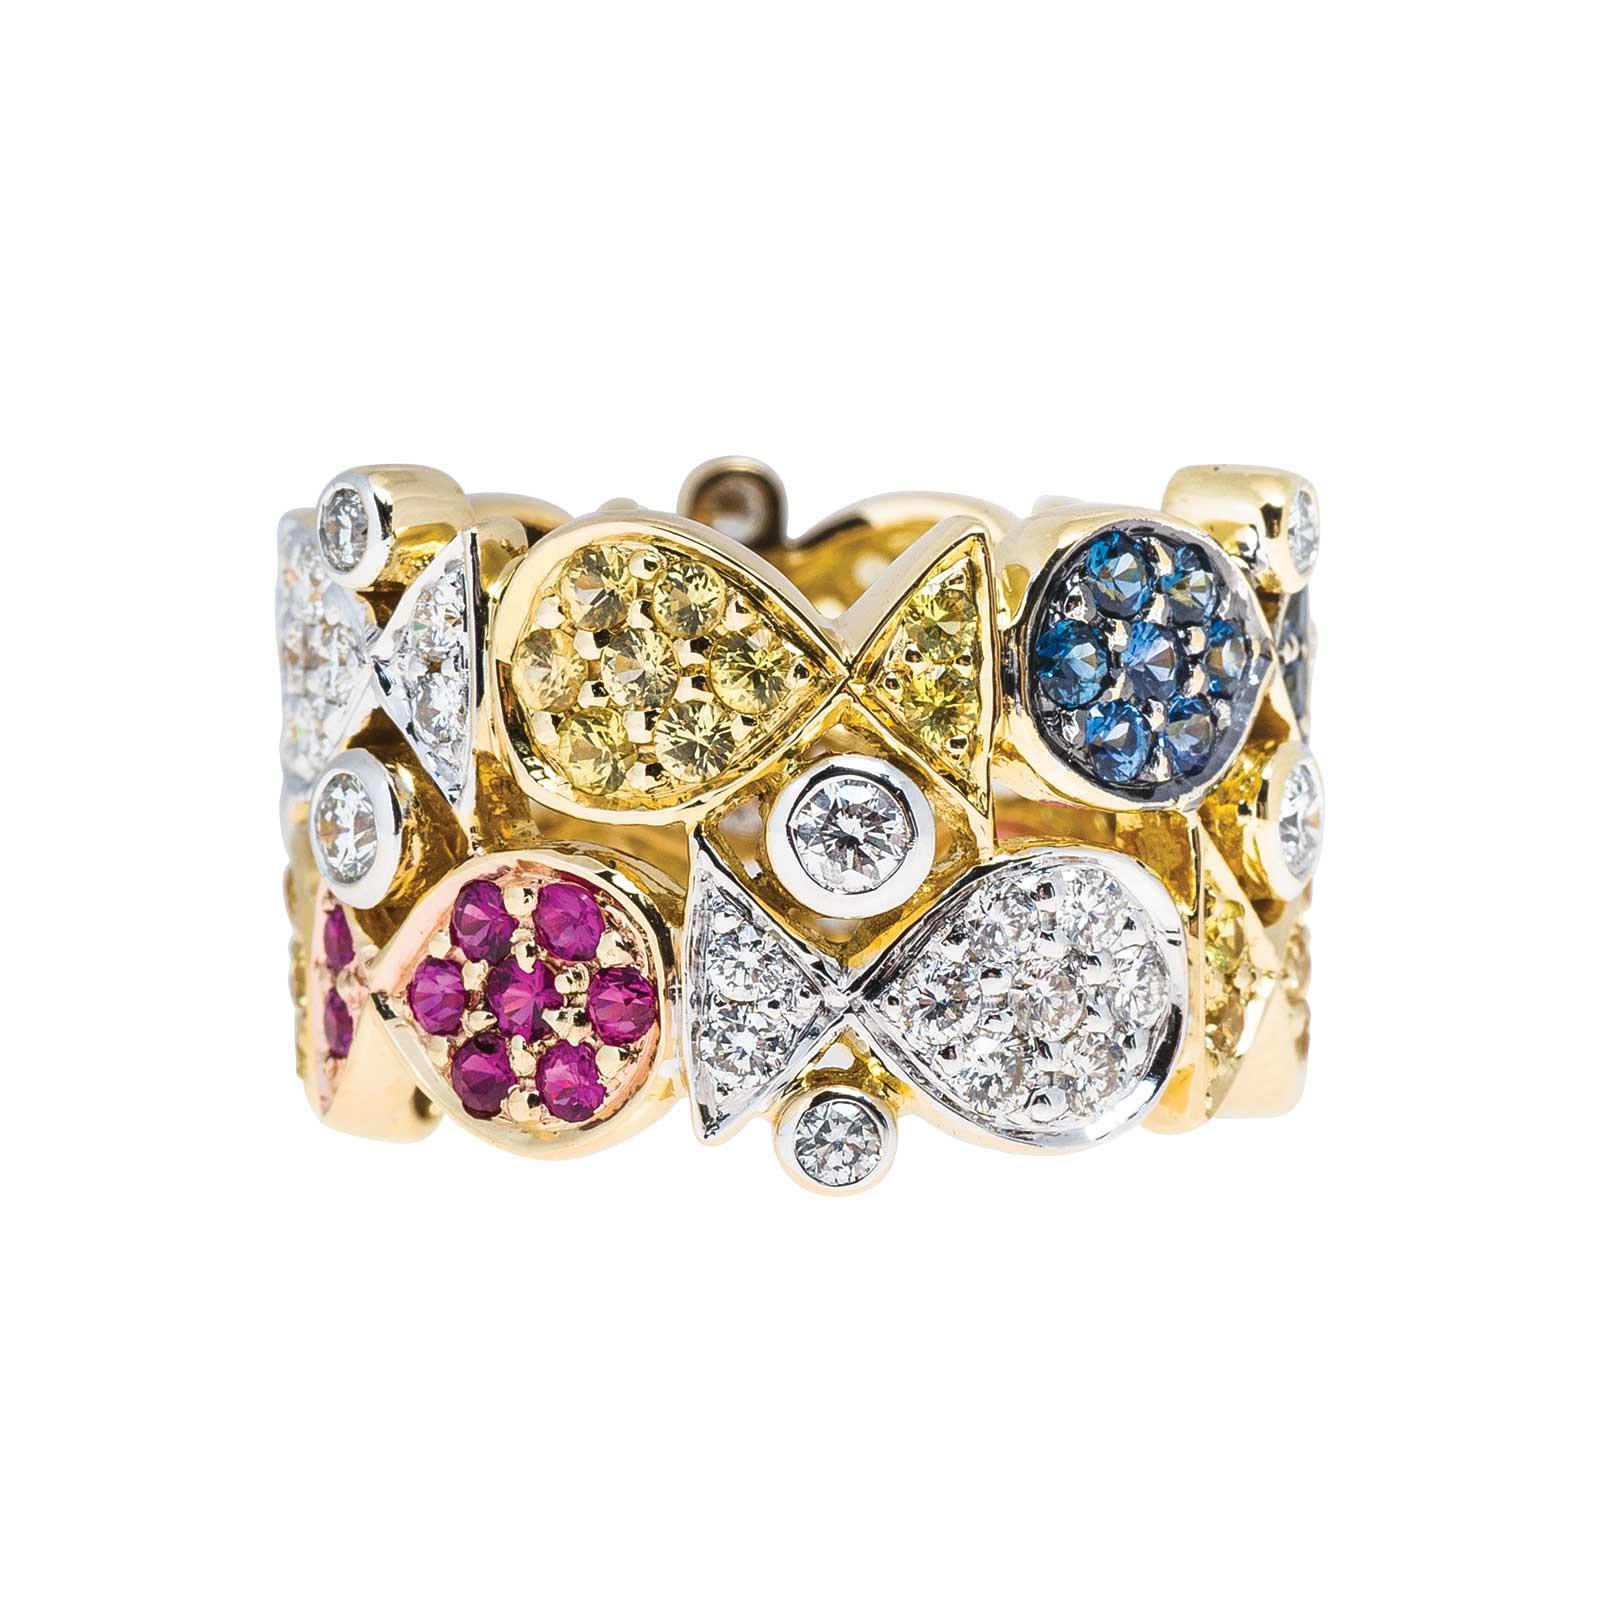 Vintage 2.70 CTW Diamond, Ruby & Sapphire Ring